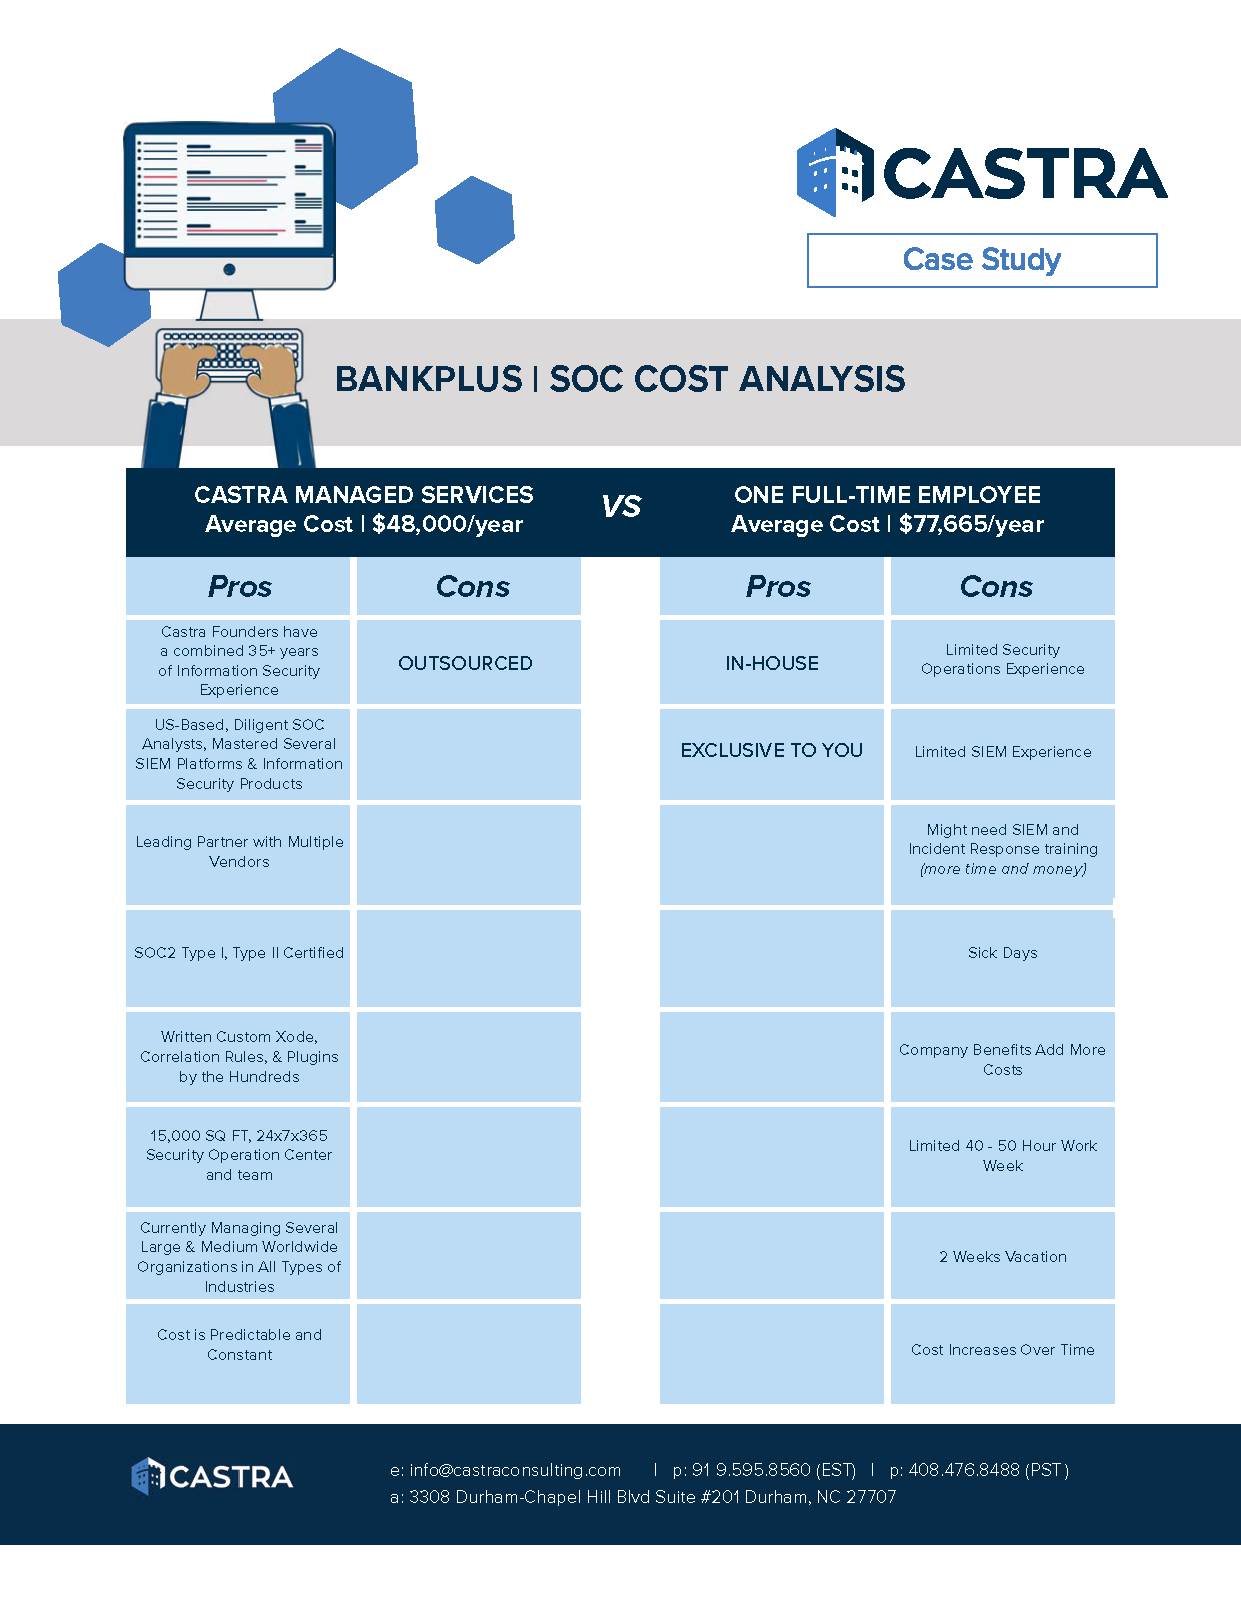 Castra_CaseStudy-BankPlus-SOCCost